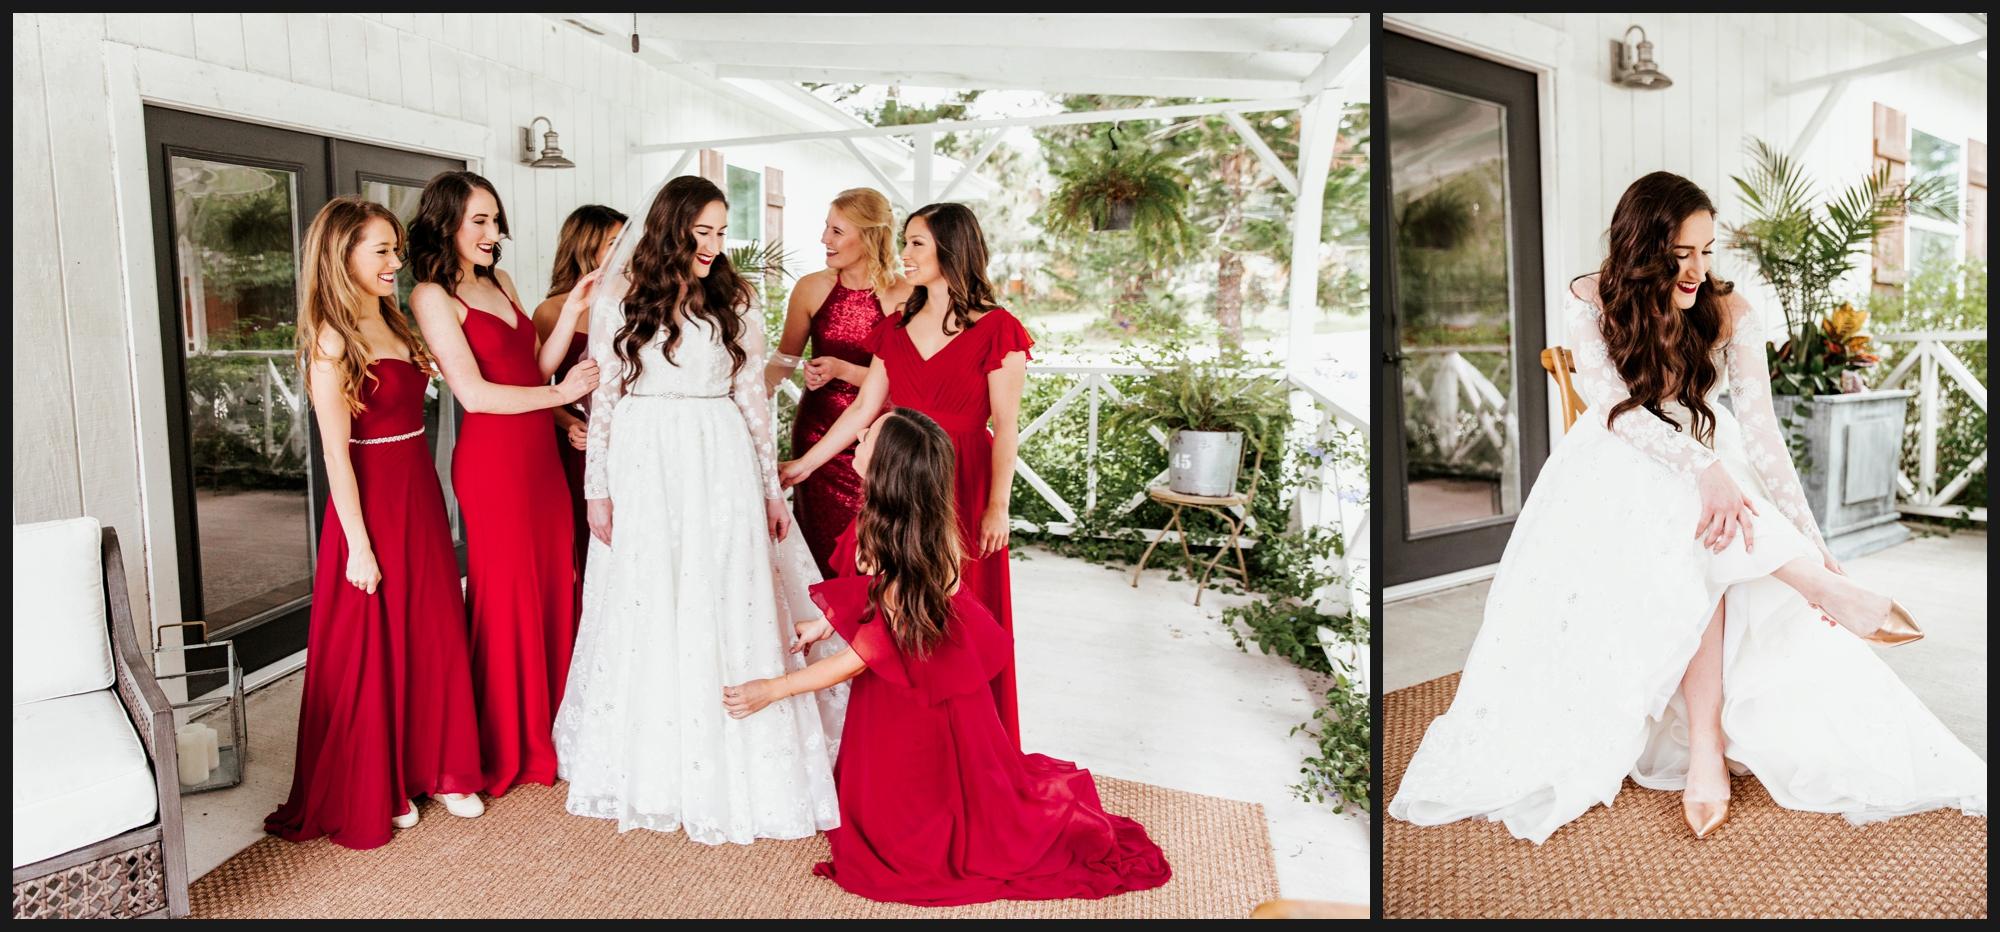 Orlando-Wedding-Photographer-destination-wedding-photographer-florida-wedding-photographer-hawaii-wedding-photographer_0471.jpg